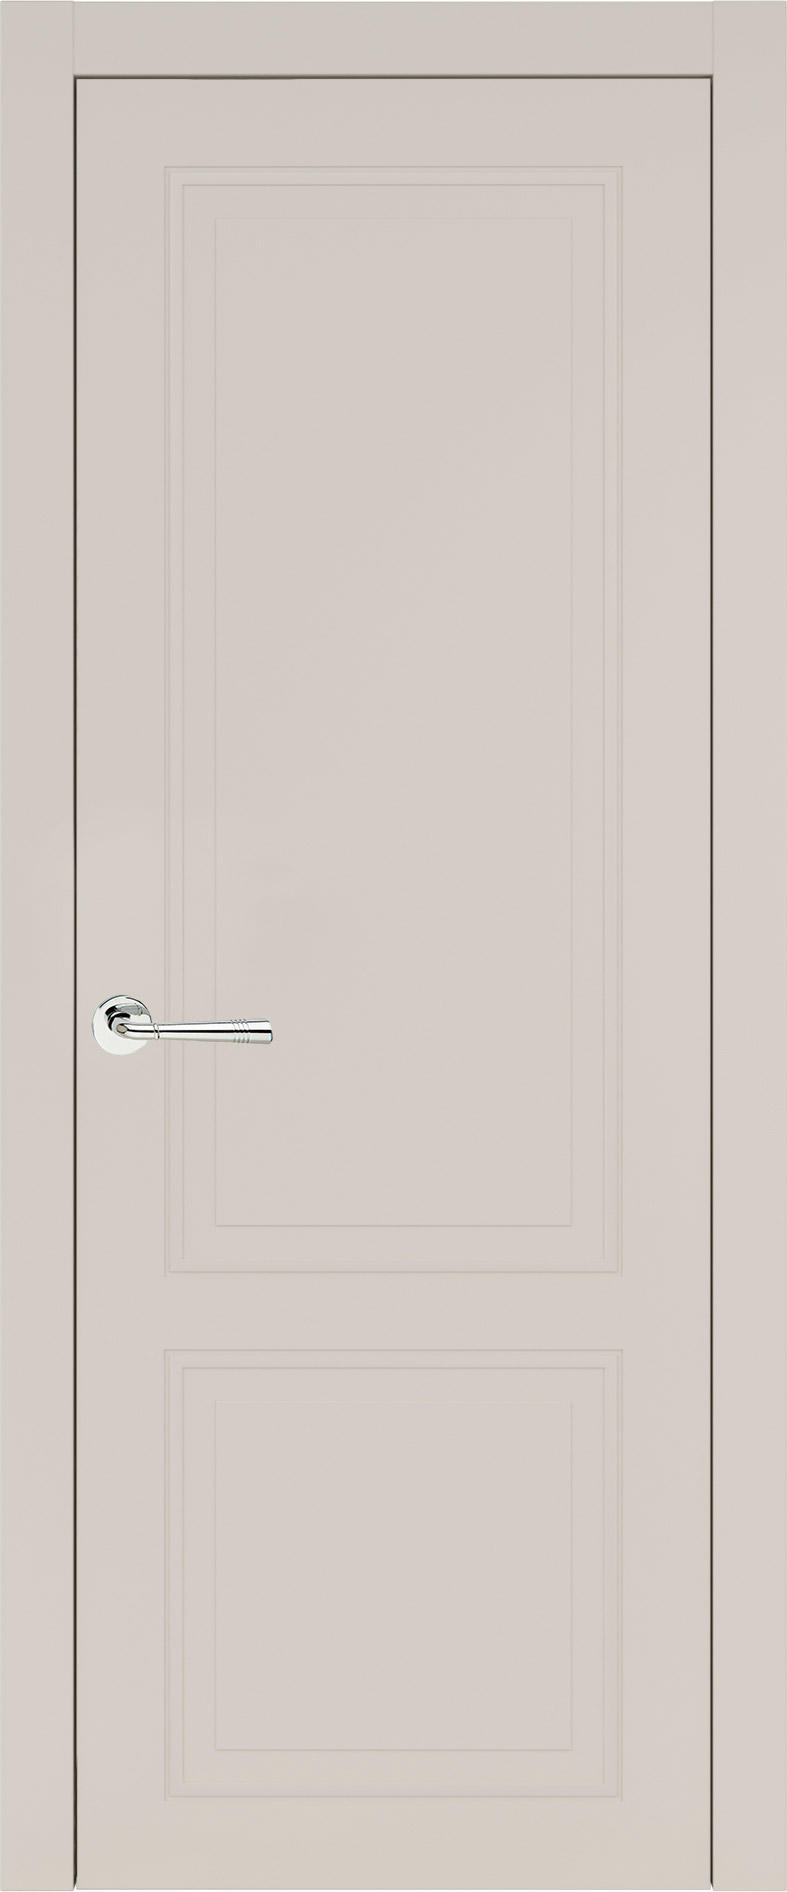 Dinastia Neo Classic цвет - Жемчужная эмаль (RAL 1013) Без стекла (ДГ)